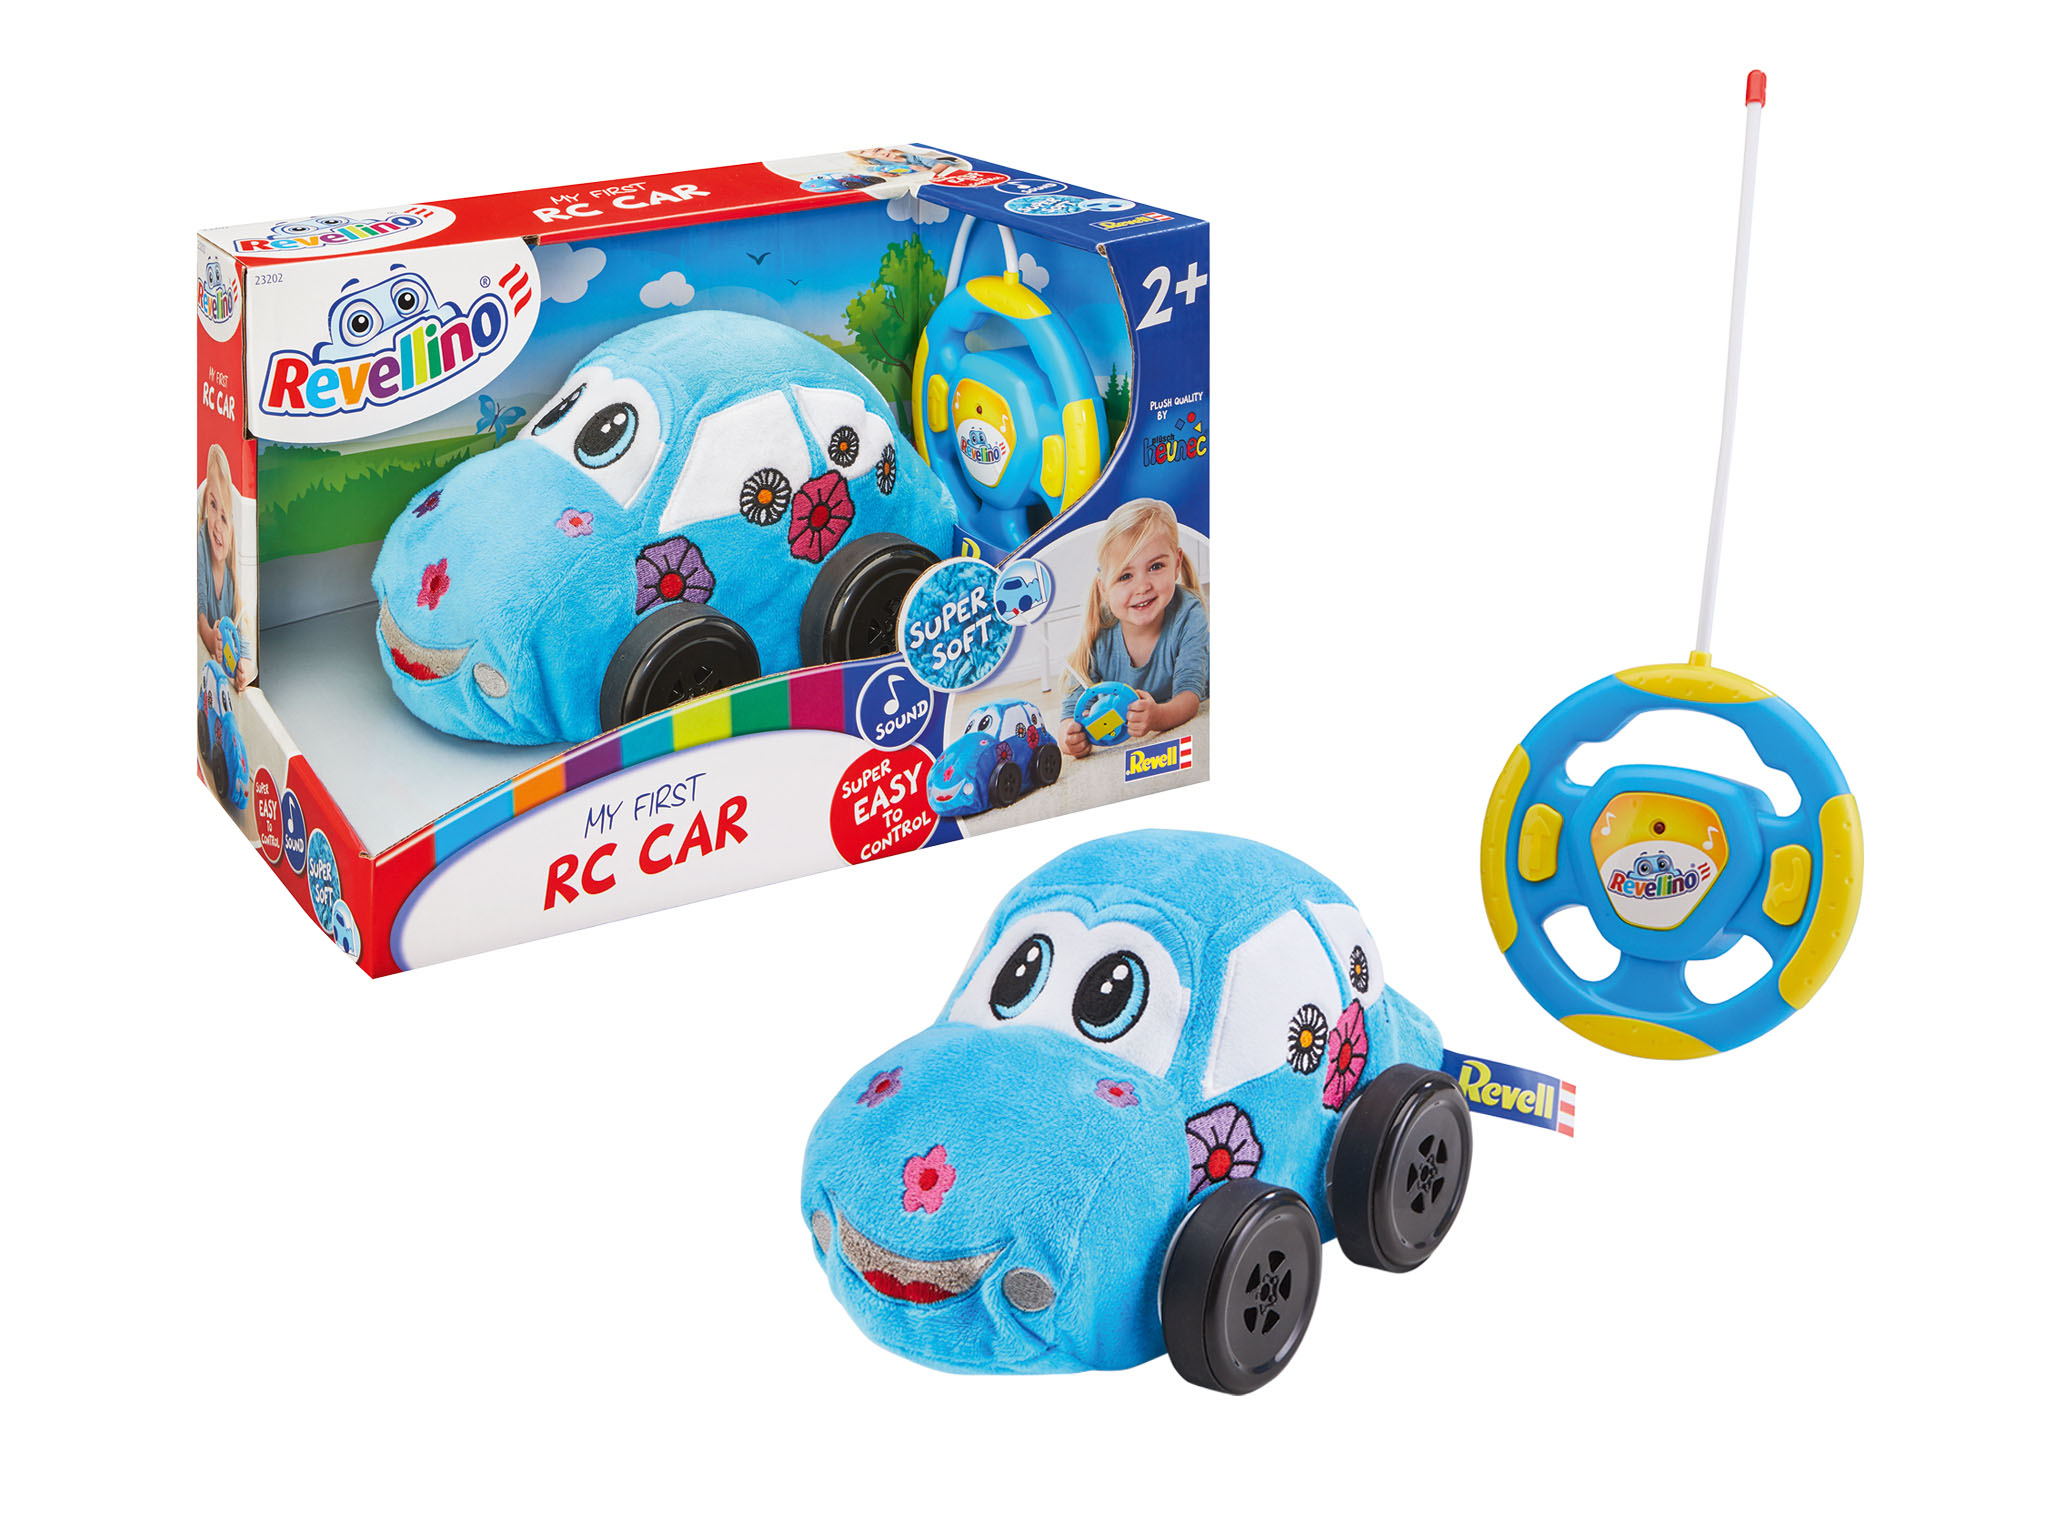 Revell My first RC Tractor Elektrisches Spielzeug